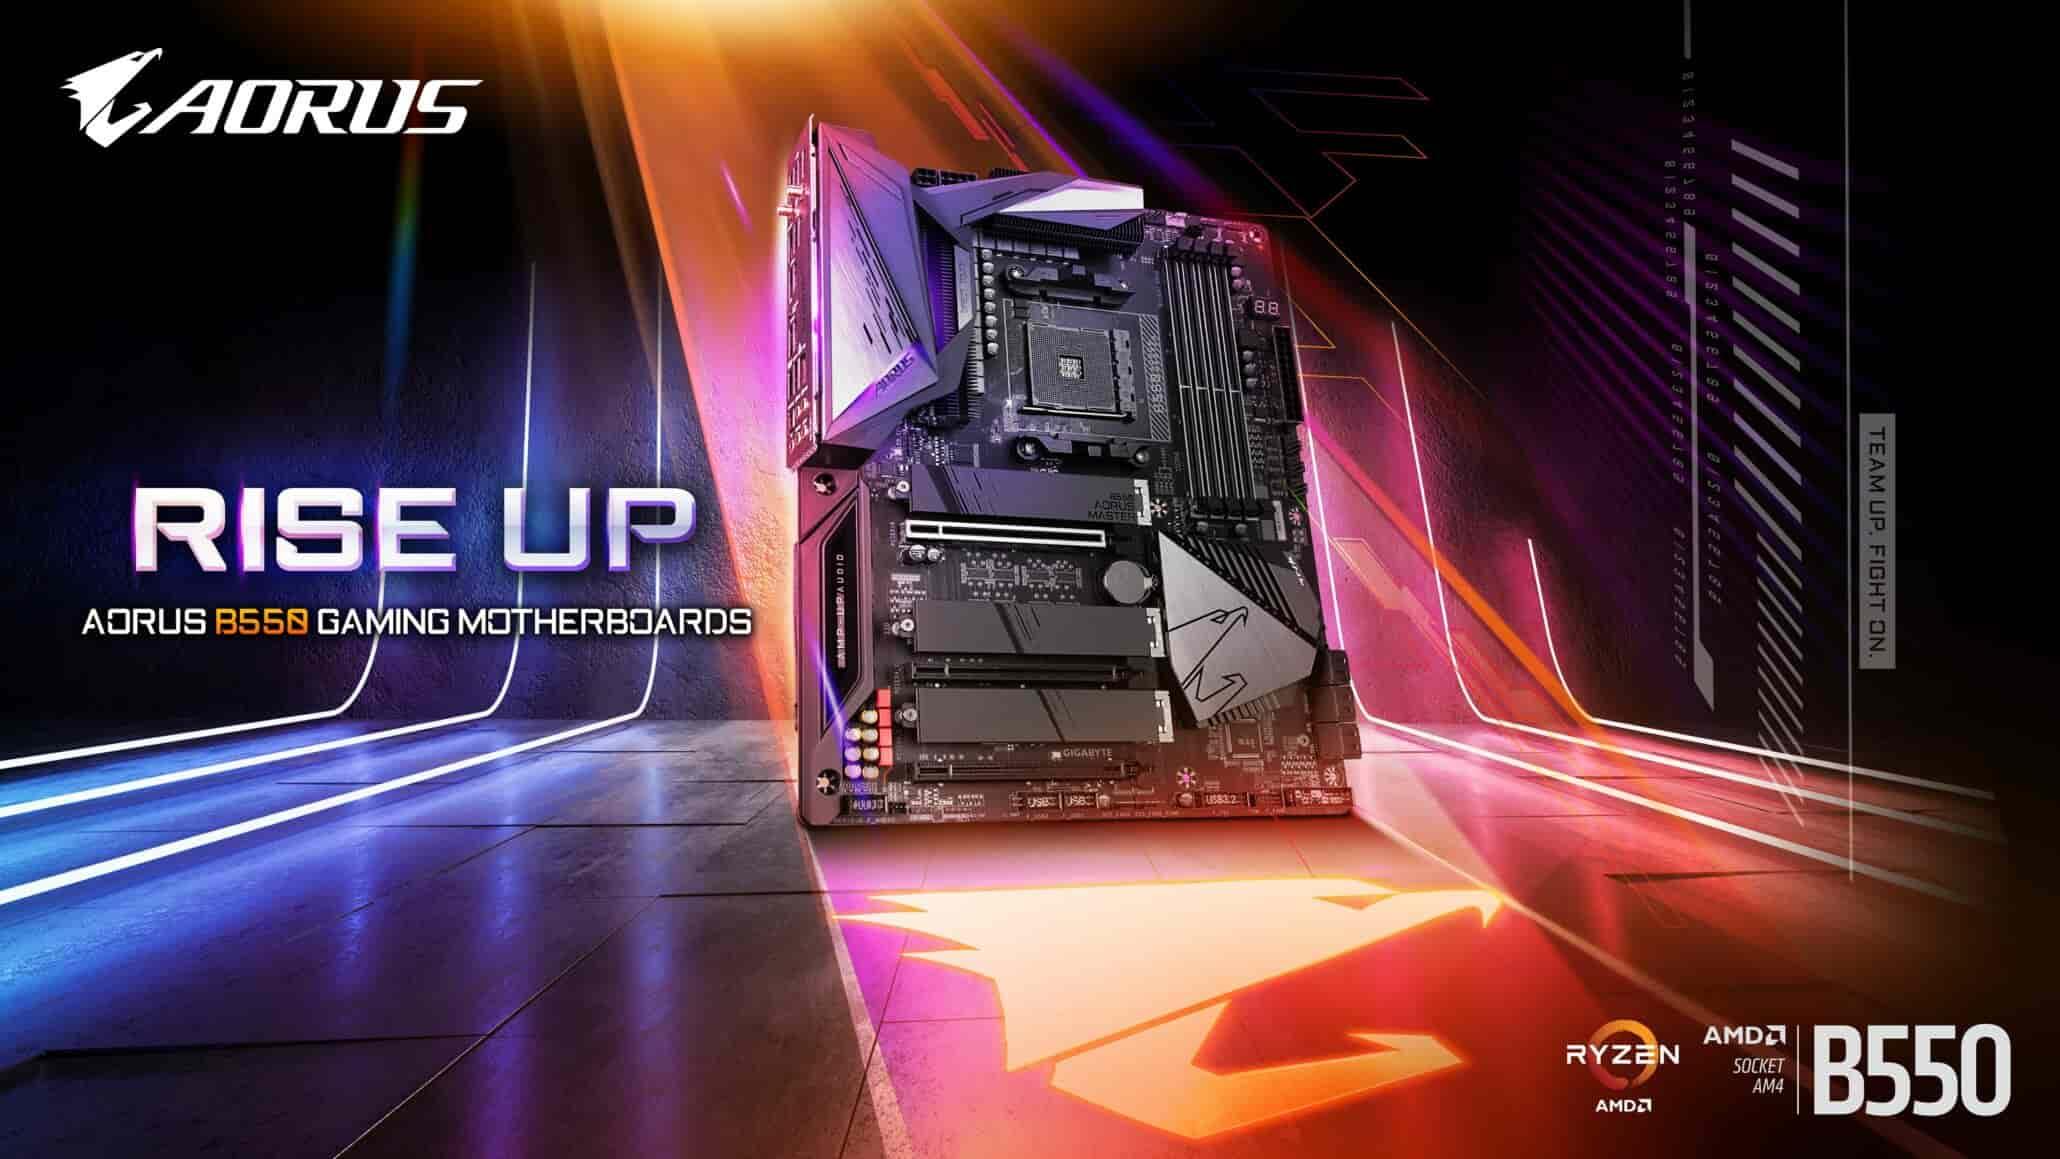 Gigabyte AMD B550 chipset motherboard